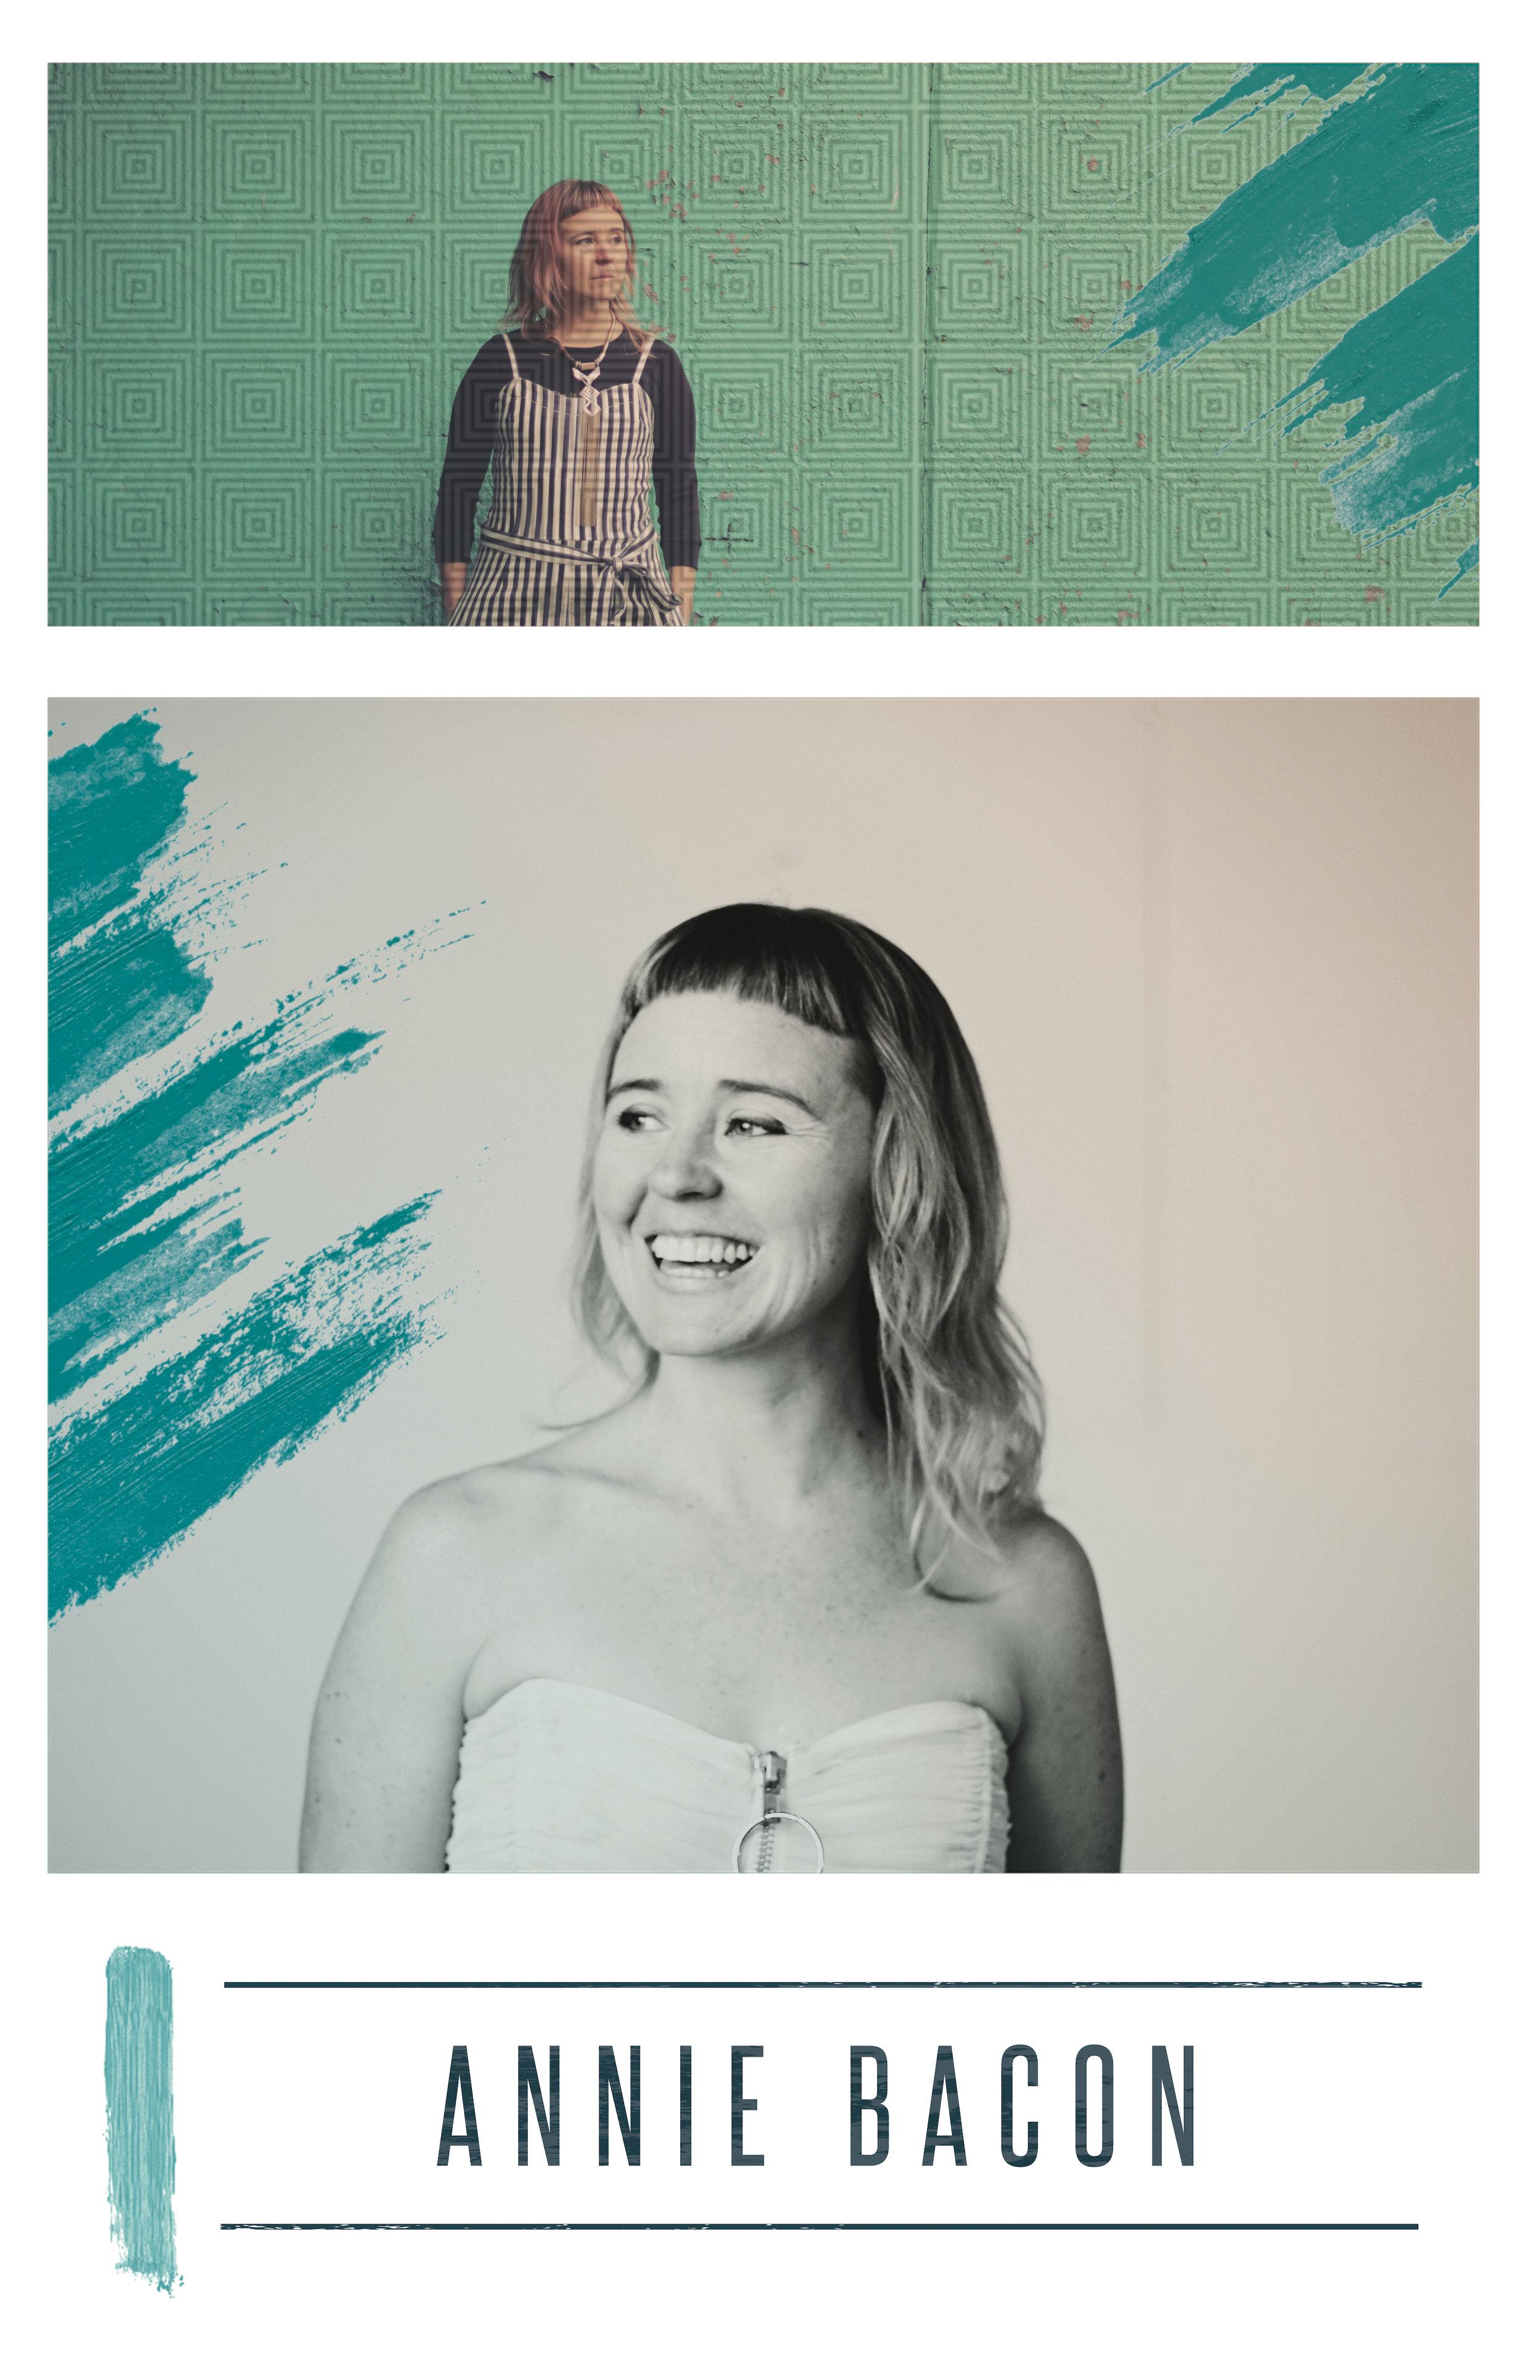 Annie Bacon - Artist Poster (2019) copy.jpg